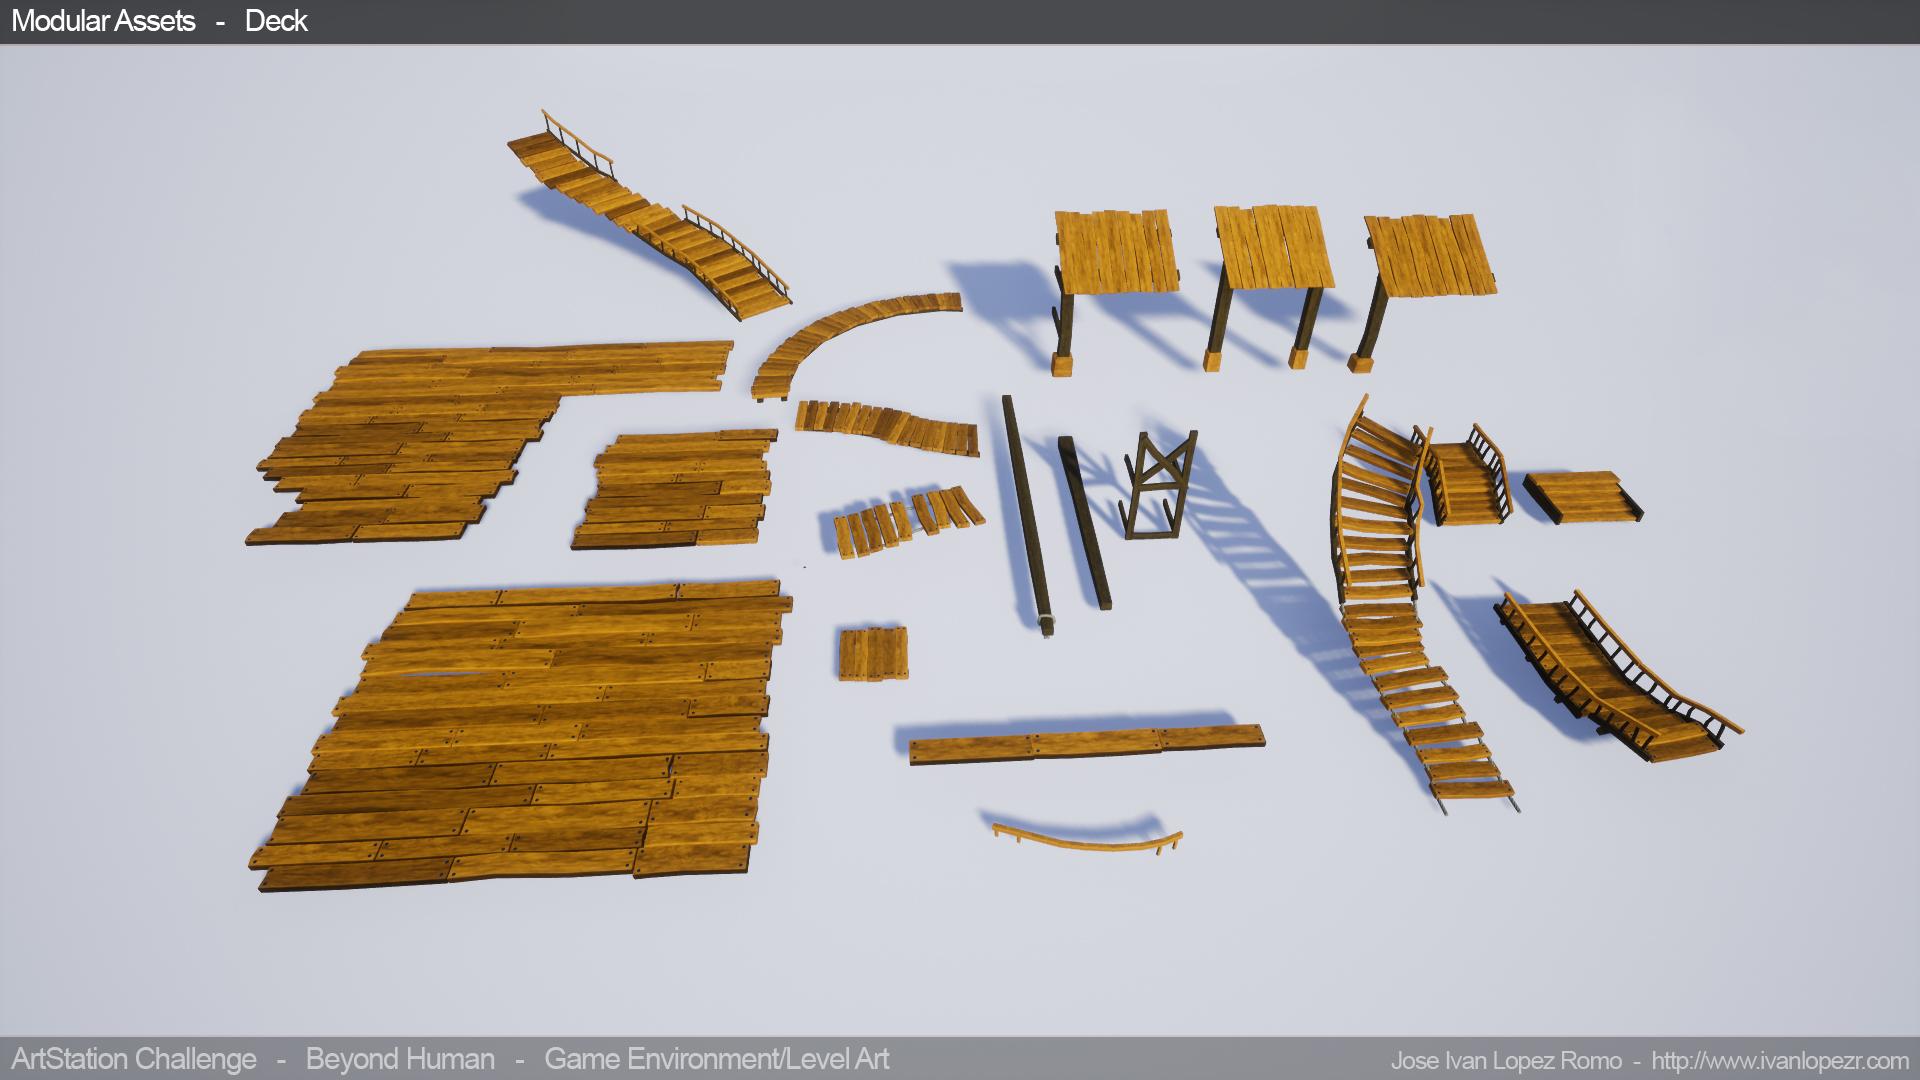 SteelSwamp-Breakdown01_JoseLopezRomo.jpg